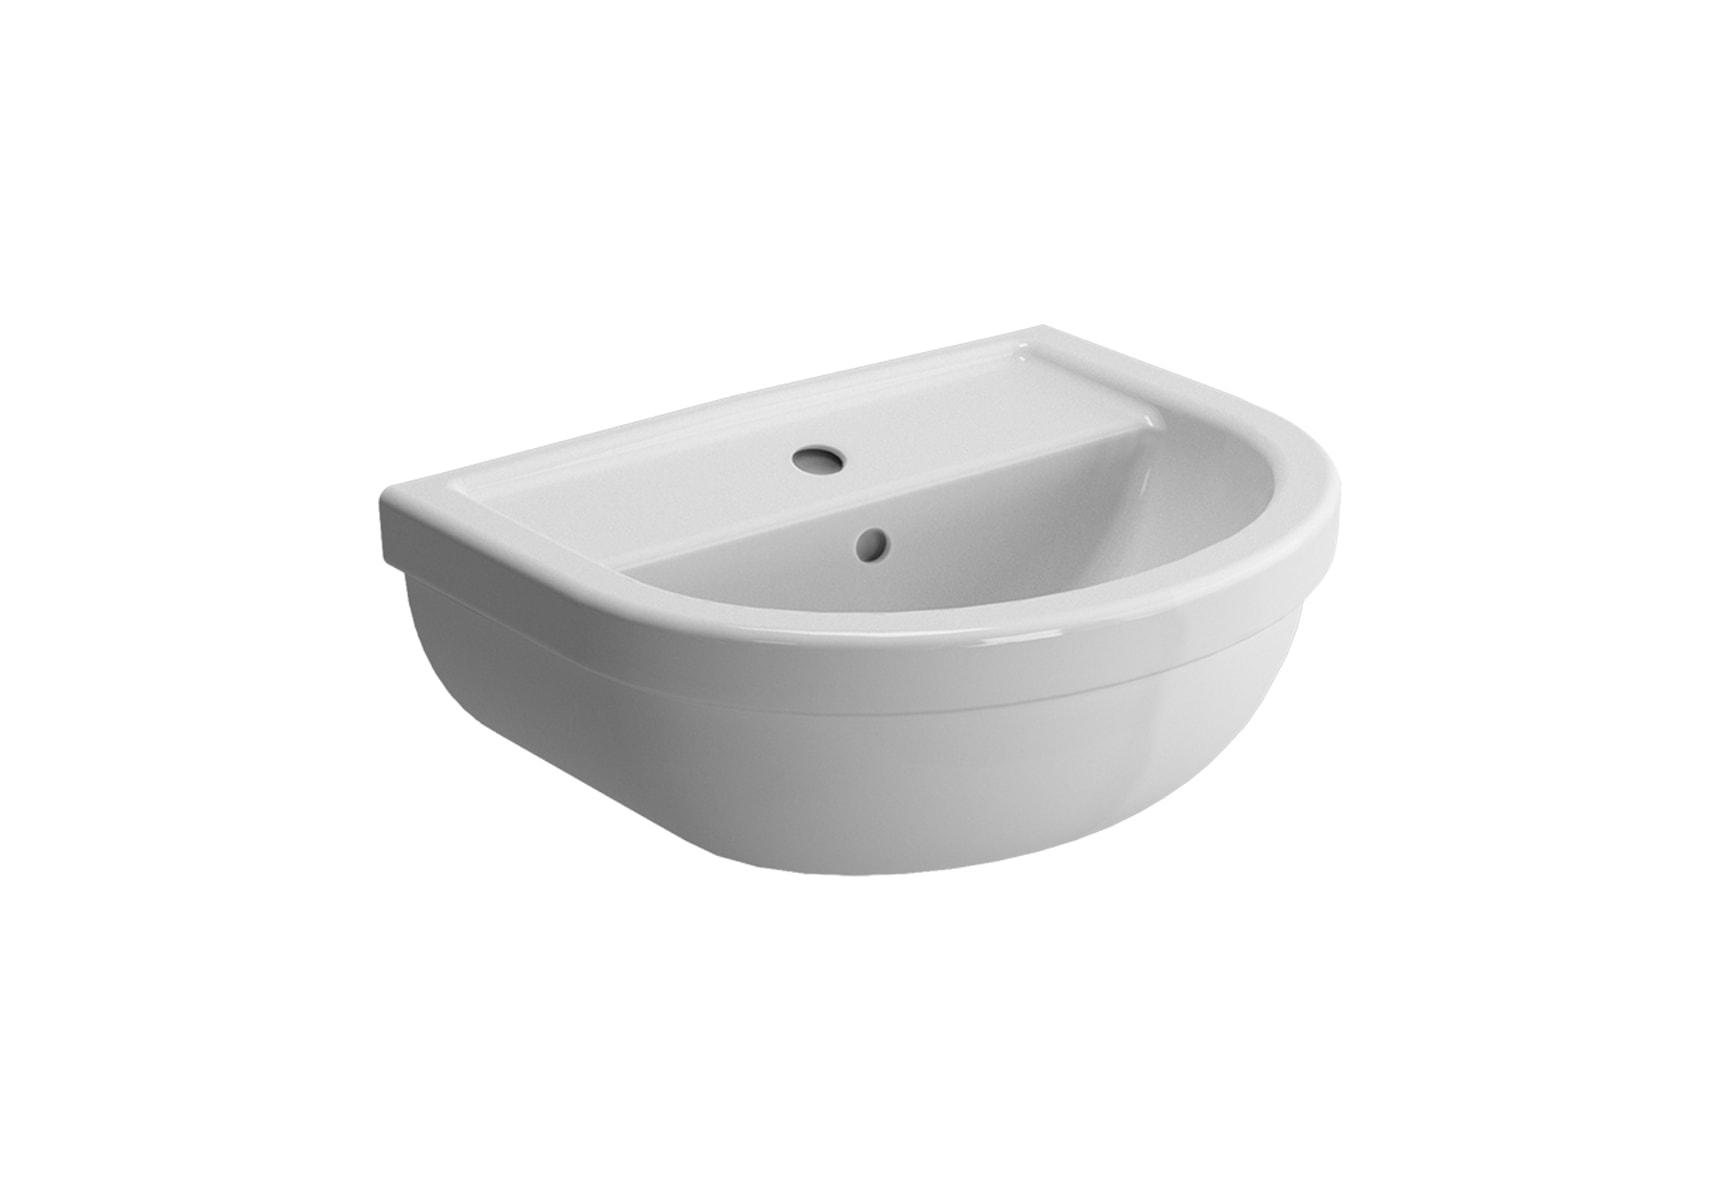 Washbasin, 45 cm, One Tap Hole, With Overflow Hole